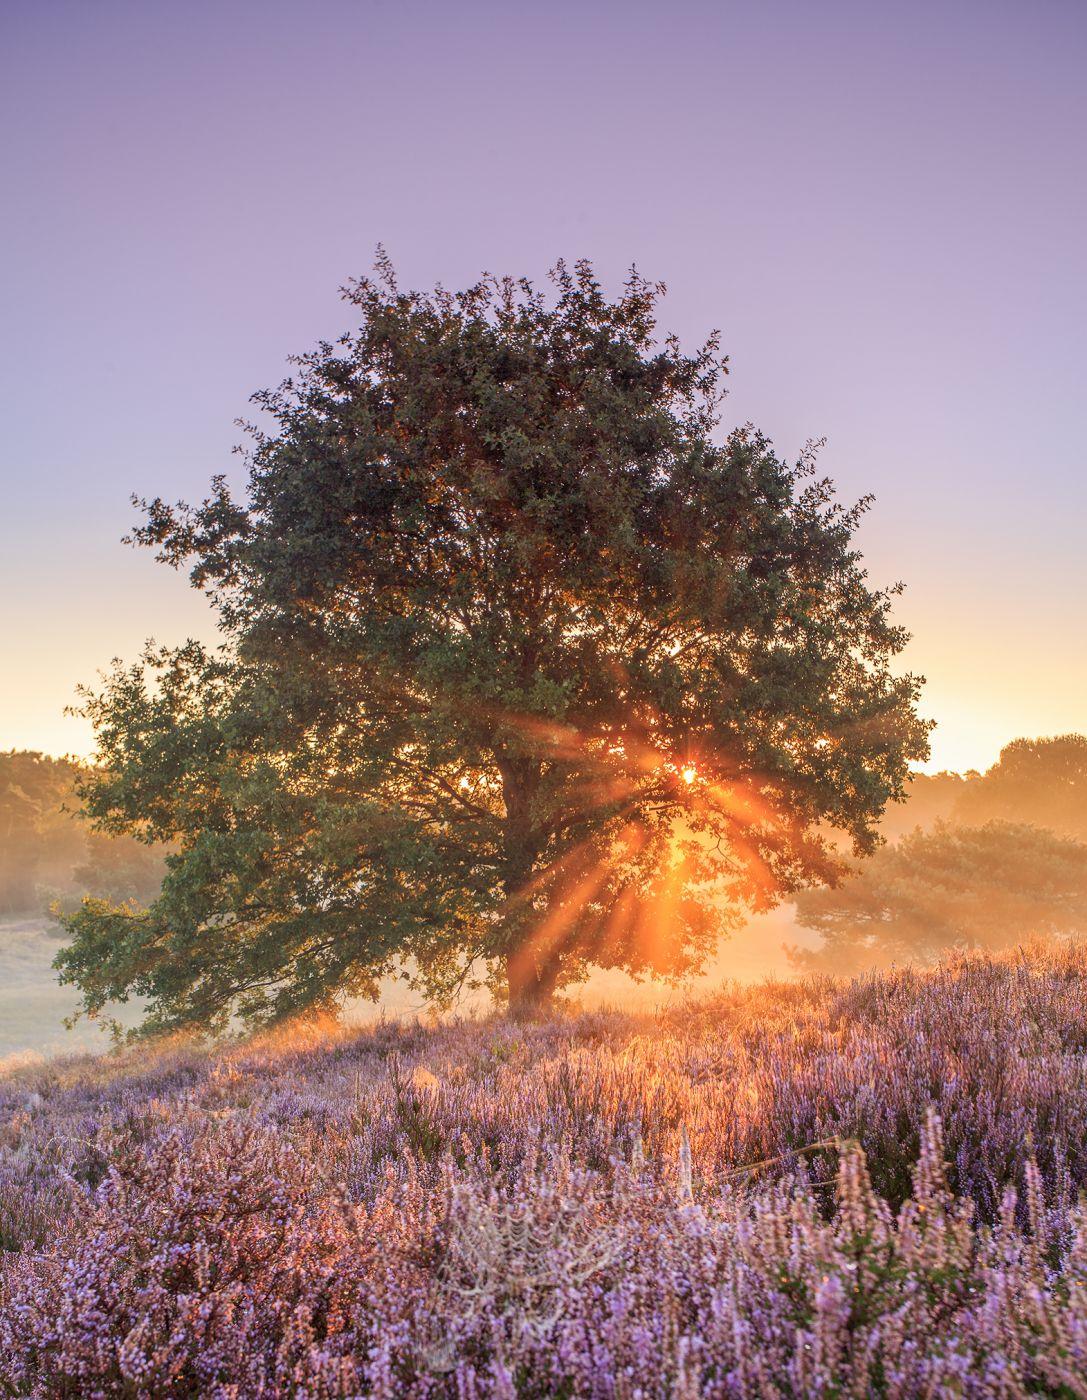 Tree in the heath, Haltern, Germany, Germany